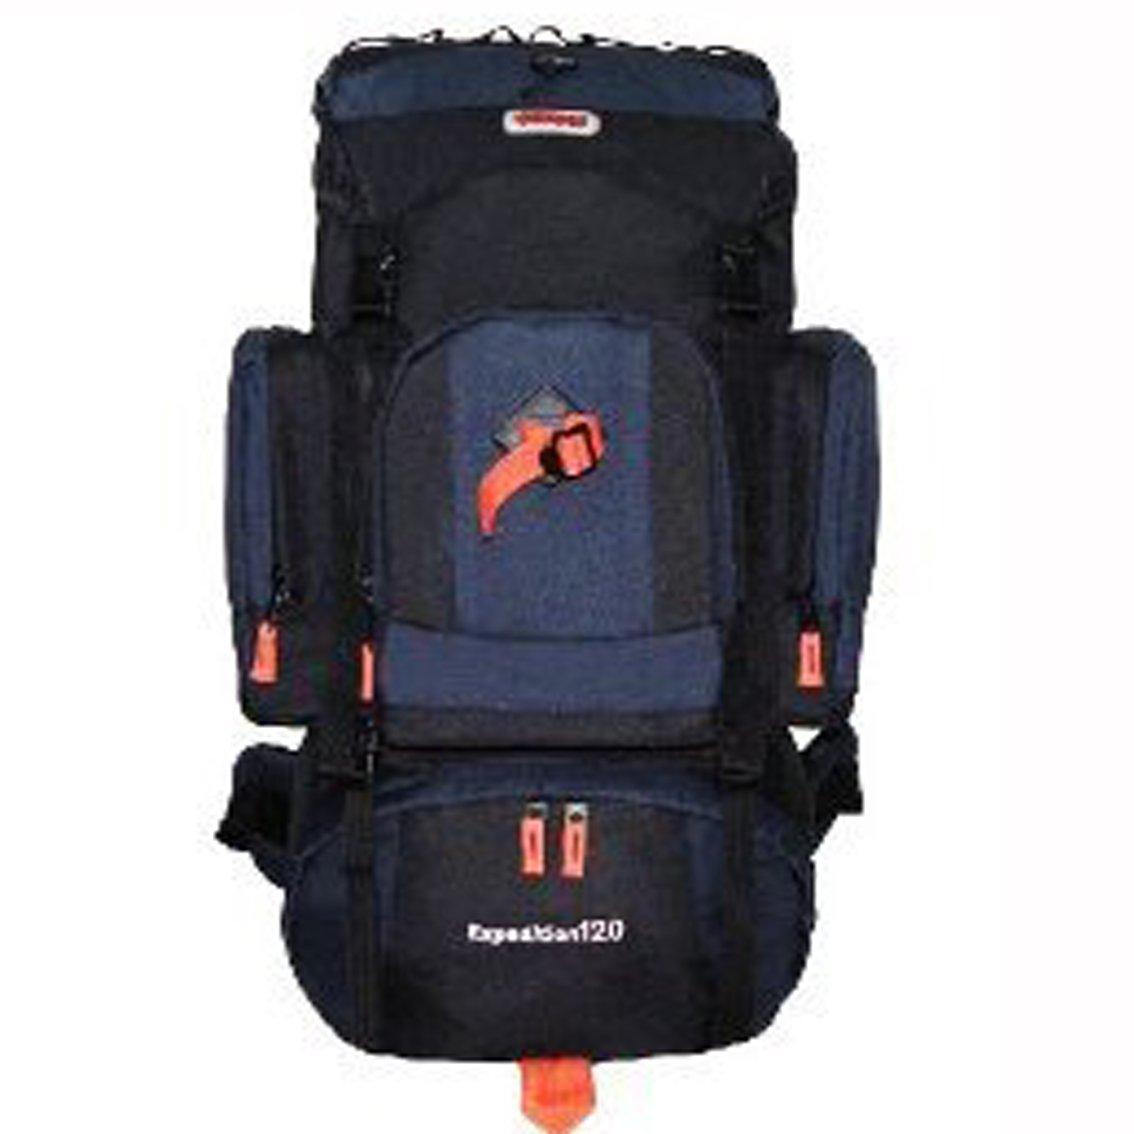 Amazon.com   CUSCUS 120L Internal Frame Hiking Camp Backpack Travel Bag  Navy Black   Aluminum Frame Backpack   Sports   Outdoors 73b197289ad67